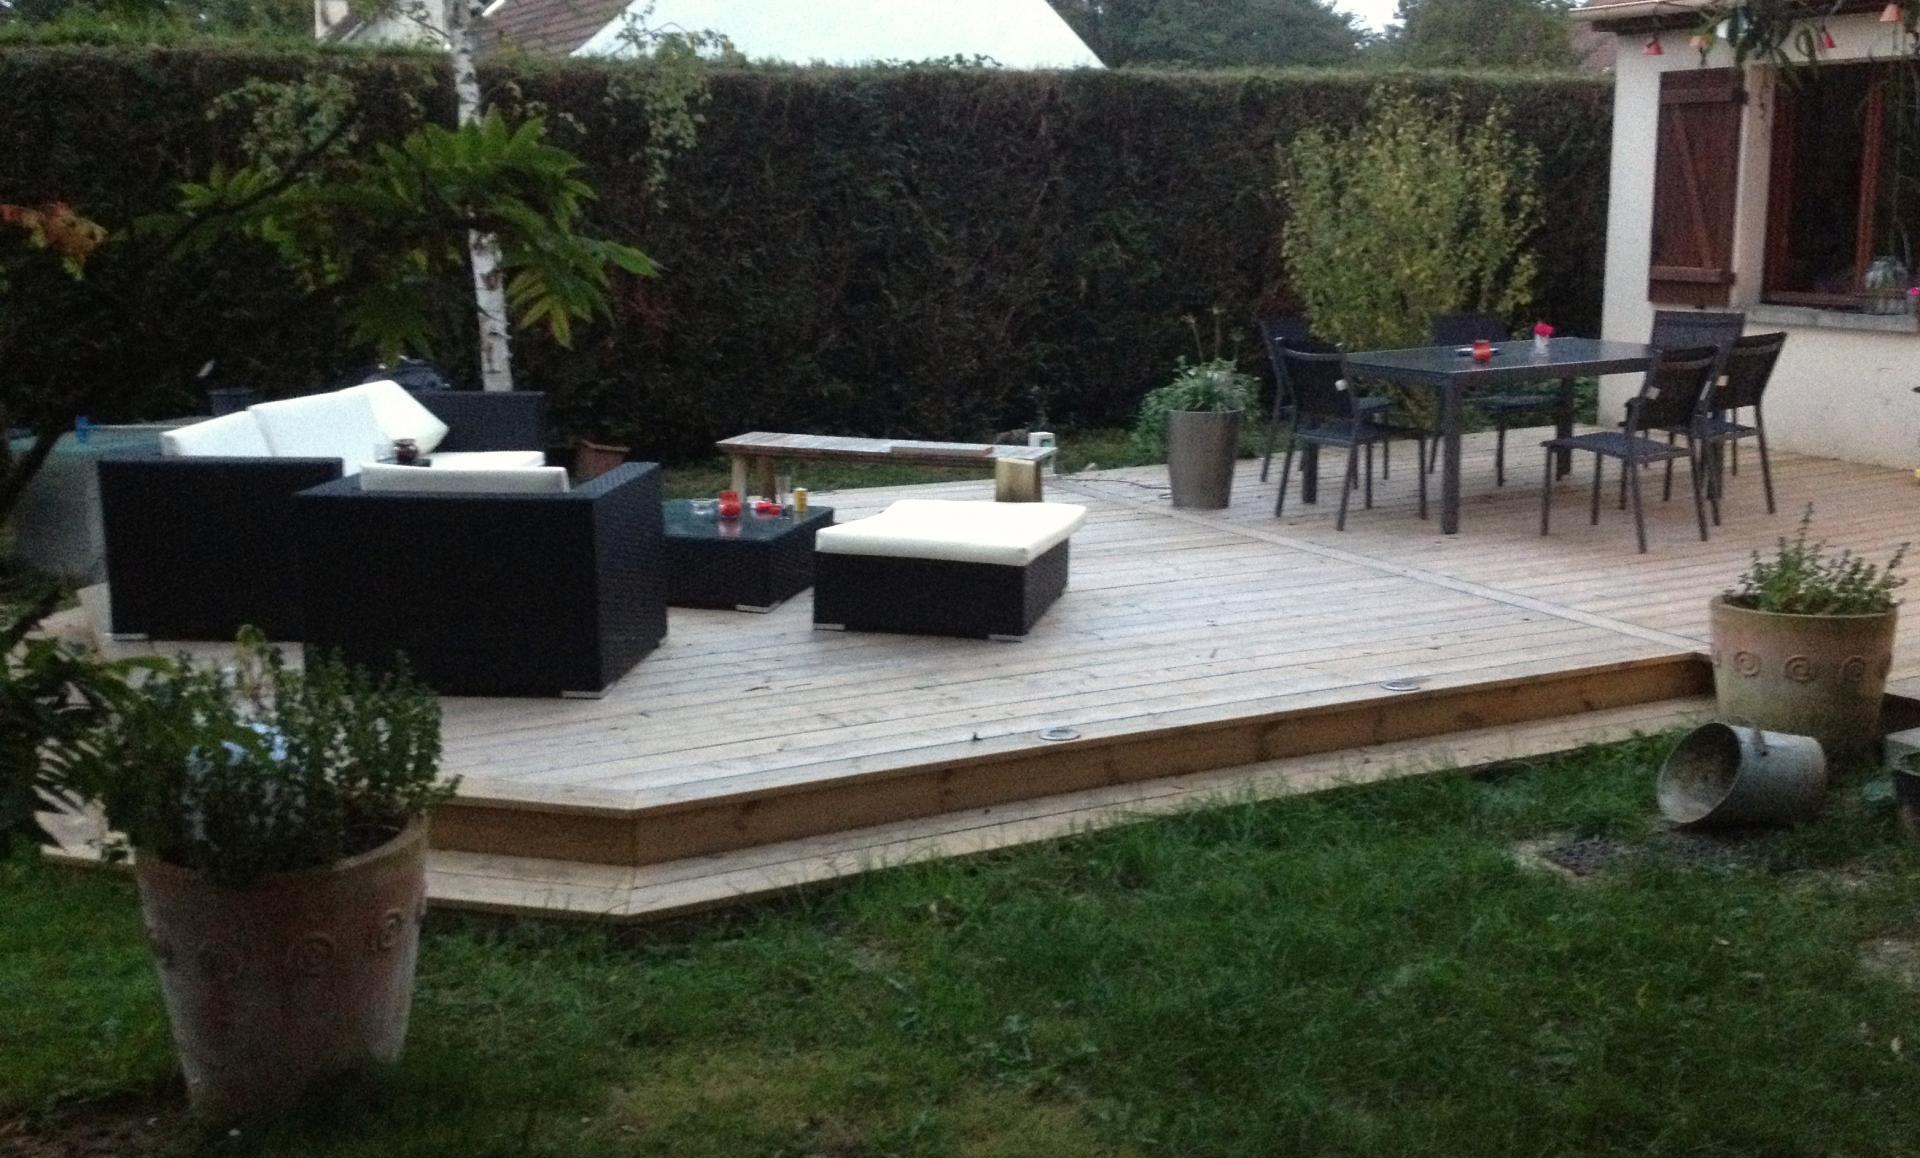 Terrasse En Bois Oise terrasse bois dans l'oise (60): spécialiste pose et création